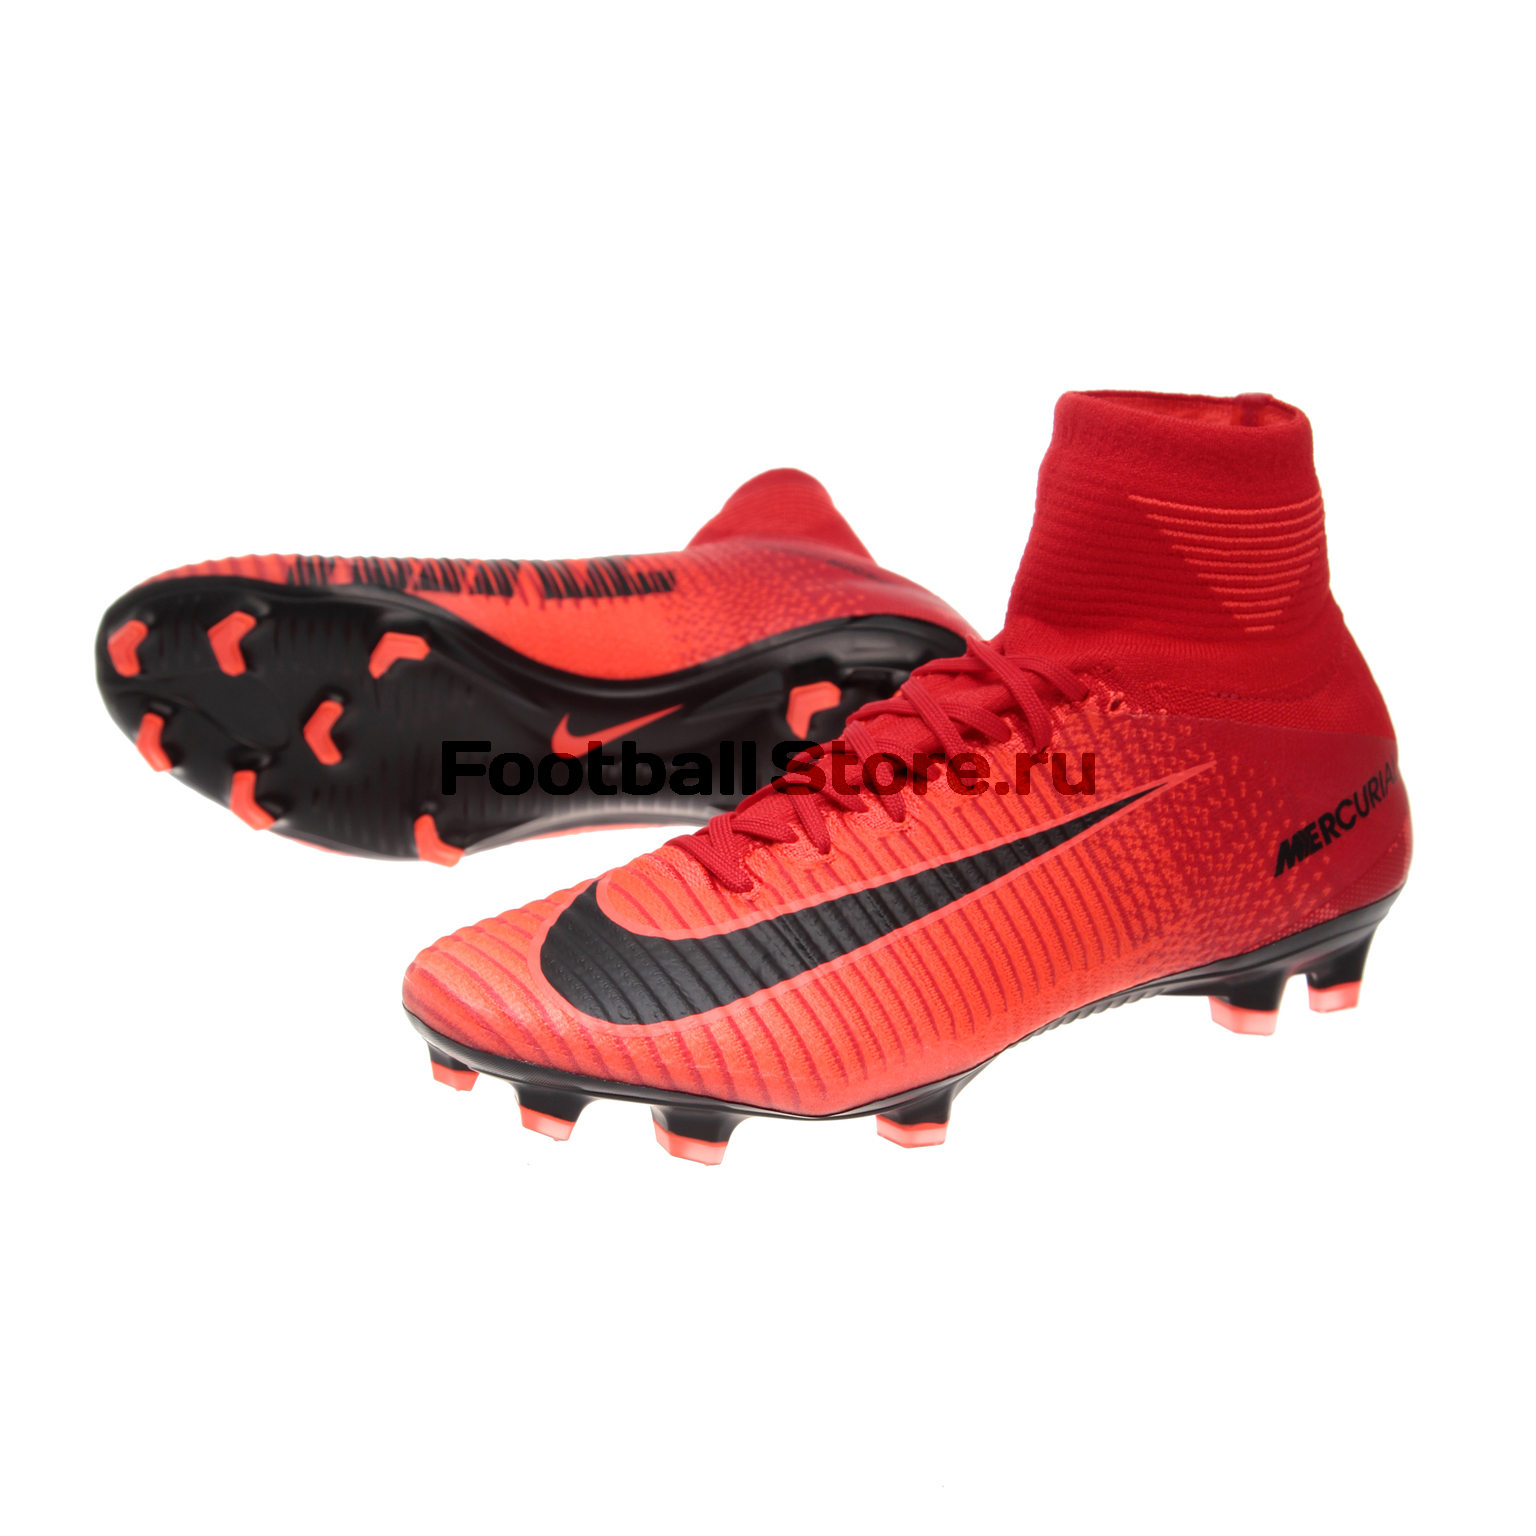 Игровые бутсы Nike Бутсы Nike Mercurial Superfly V DF FG 831940-616 игровые бутсы nike бутсы nike mercurial superfly v df fg 831940 801